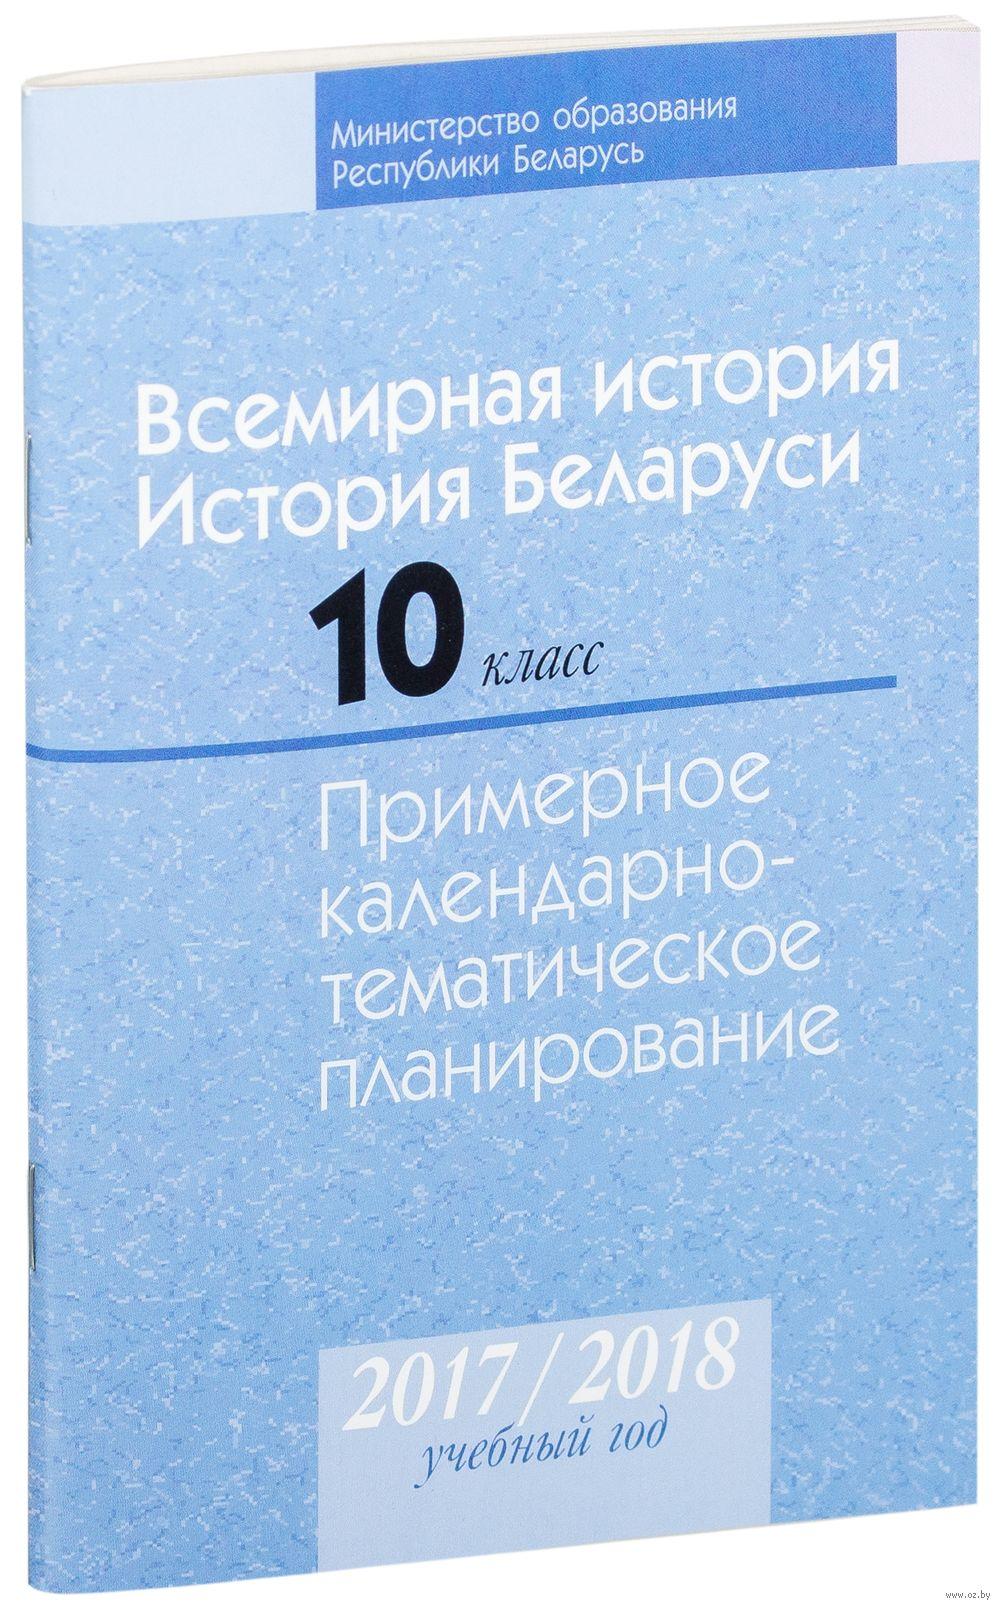 учебник история беларуси 10 класс